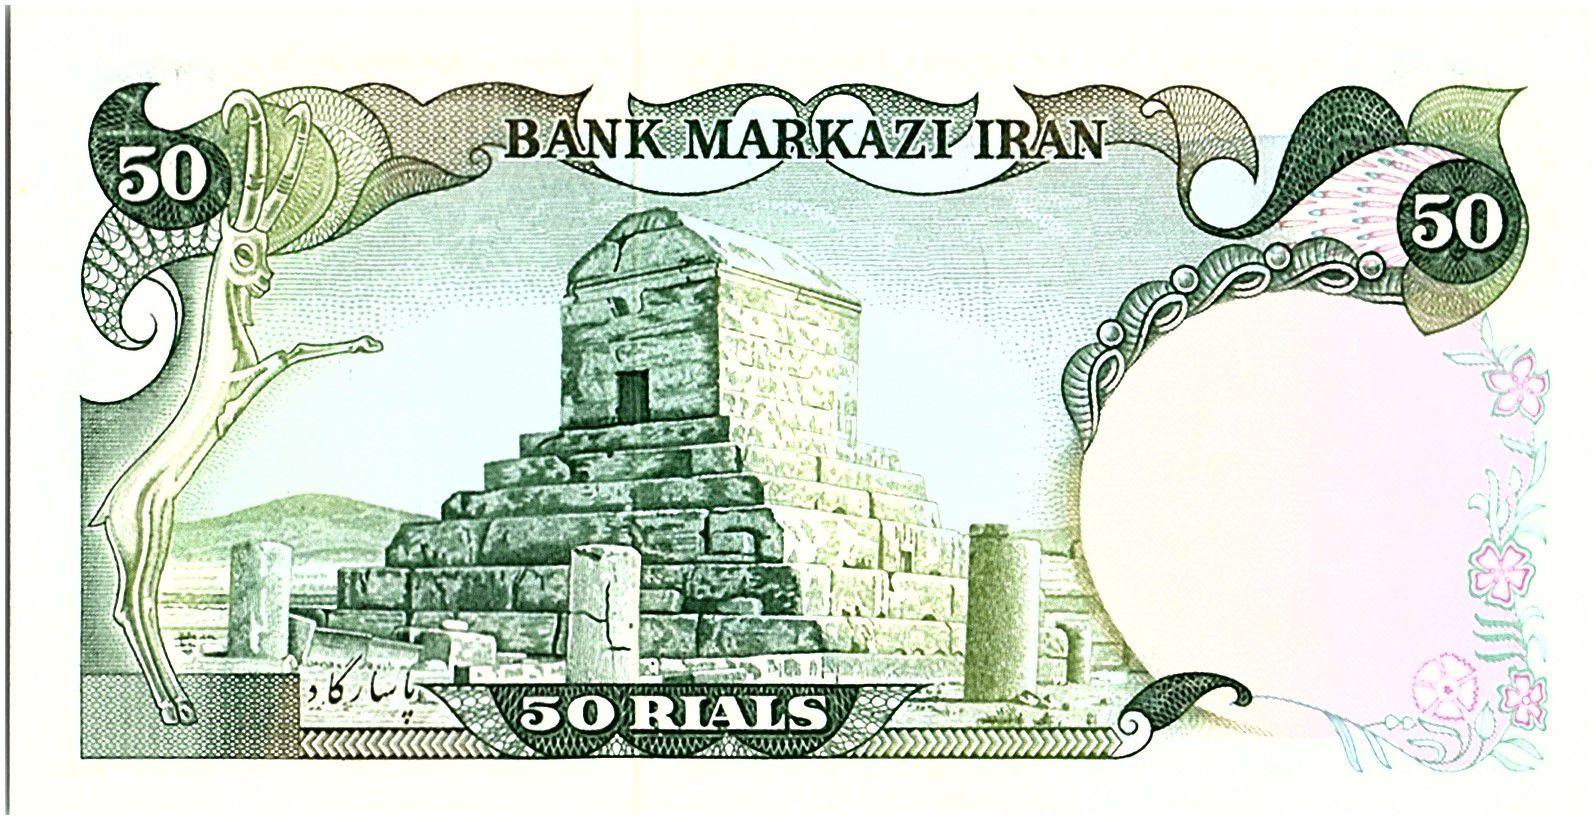 Iran 50 Rials , Mohammad Reza Pahlavi - Surcharge Rép Islamique  - 1980 - P.111 b